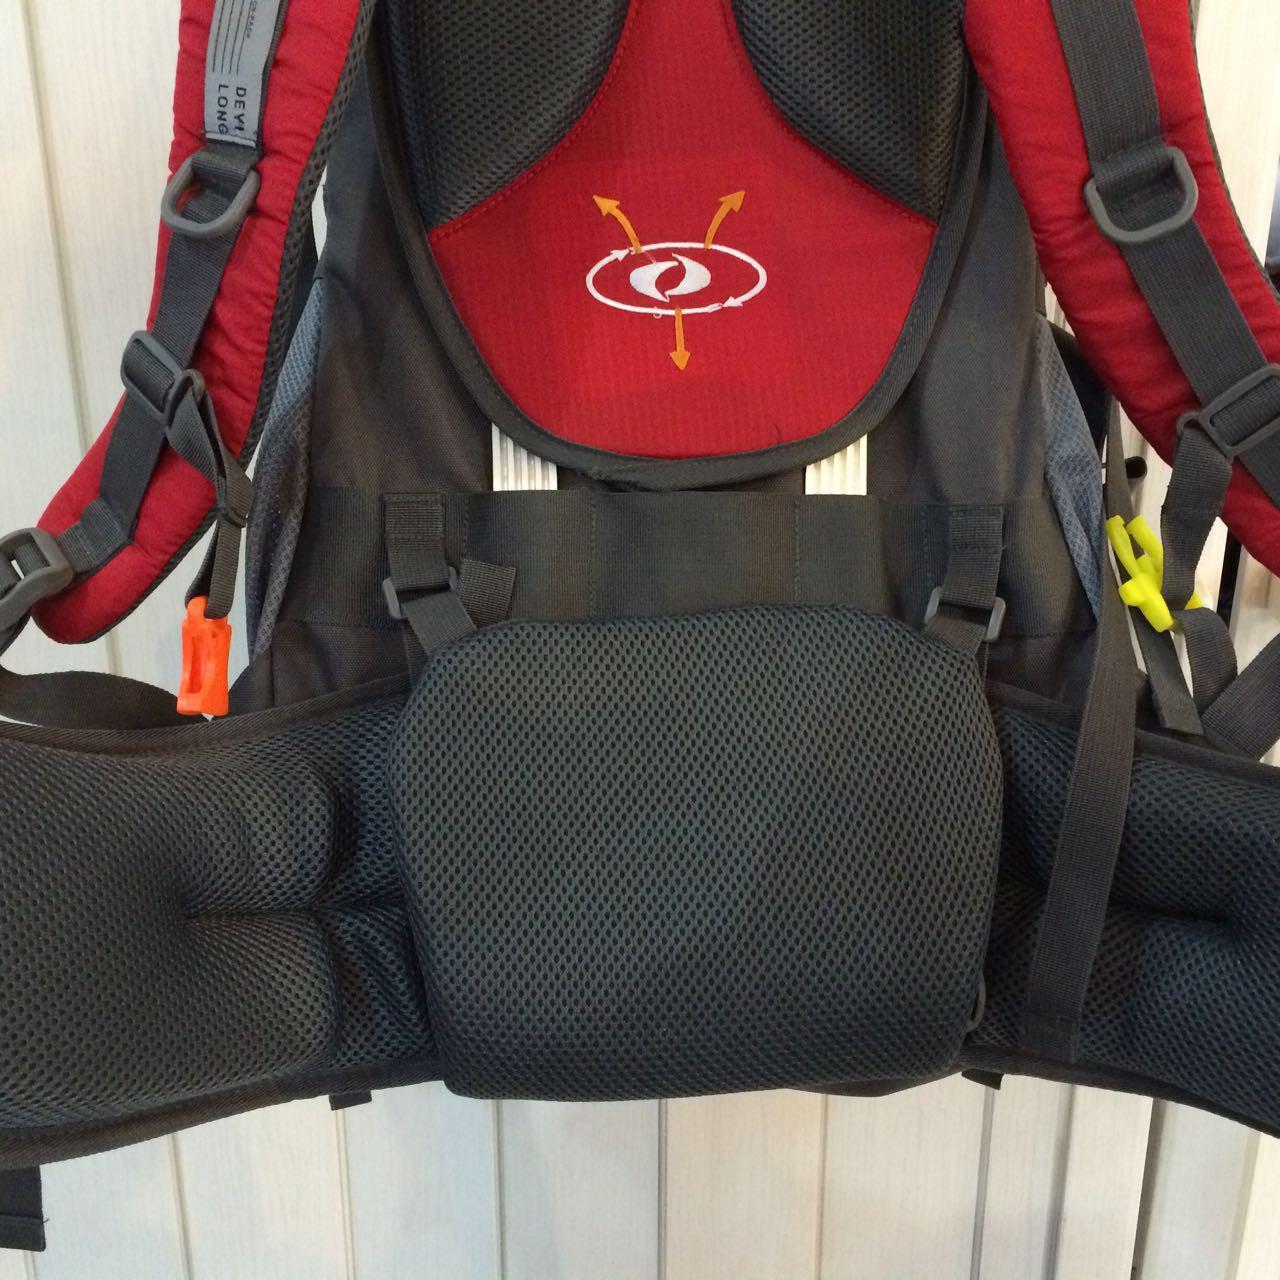 Горный рюкзак Capacity 80L - фото 5